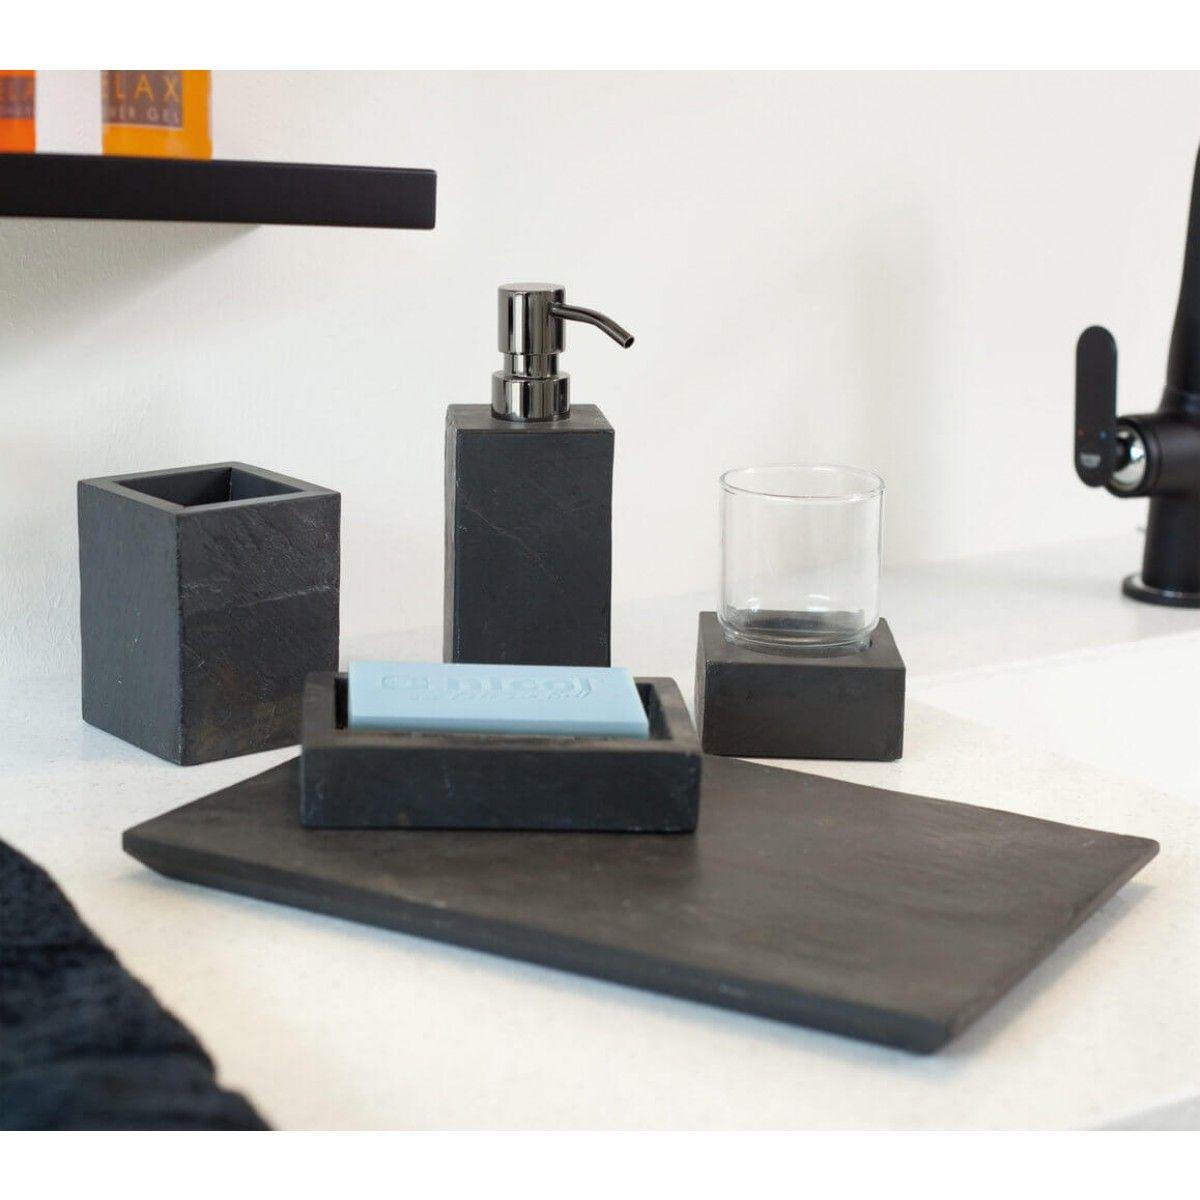 Exklusive Badezimmer Accessoires Bathroom Sets Soap Dispenser House Design